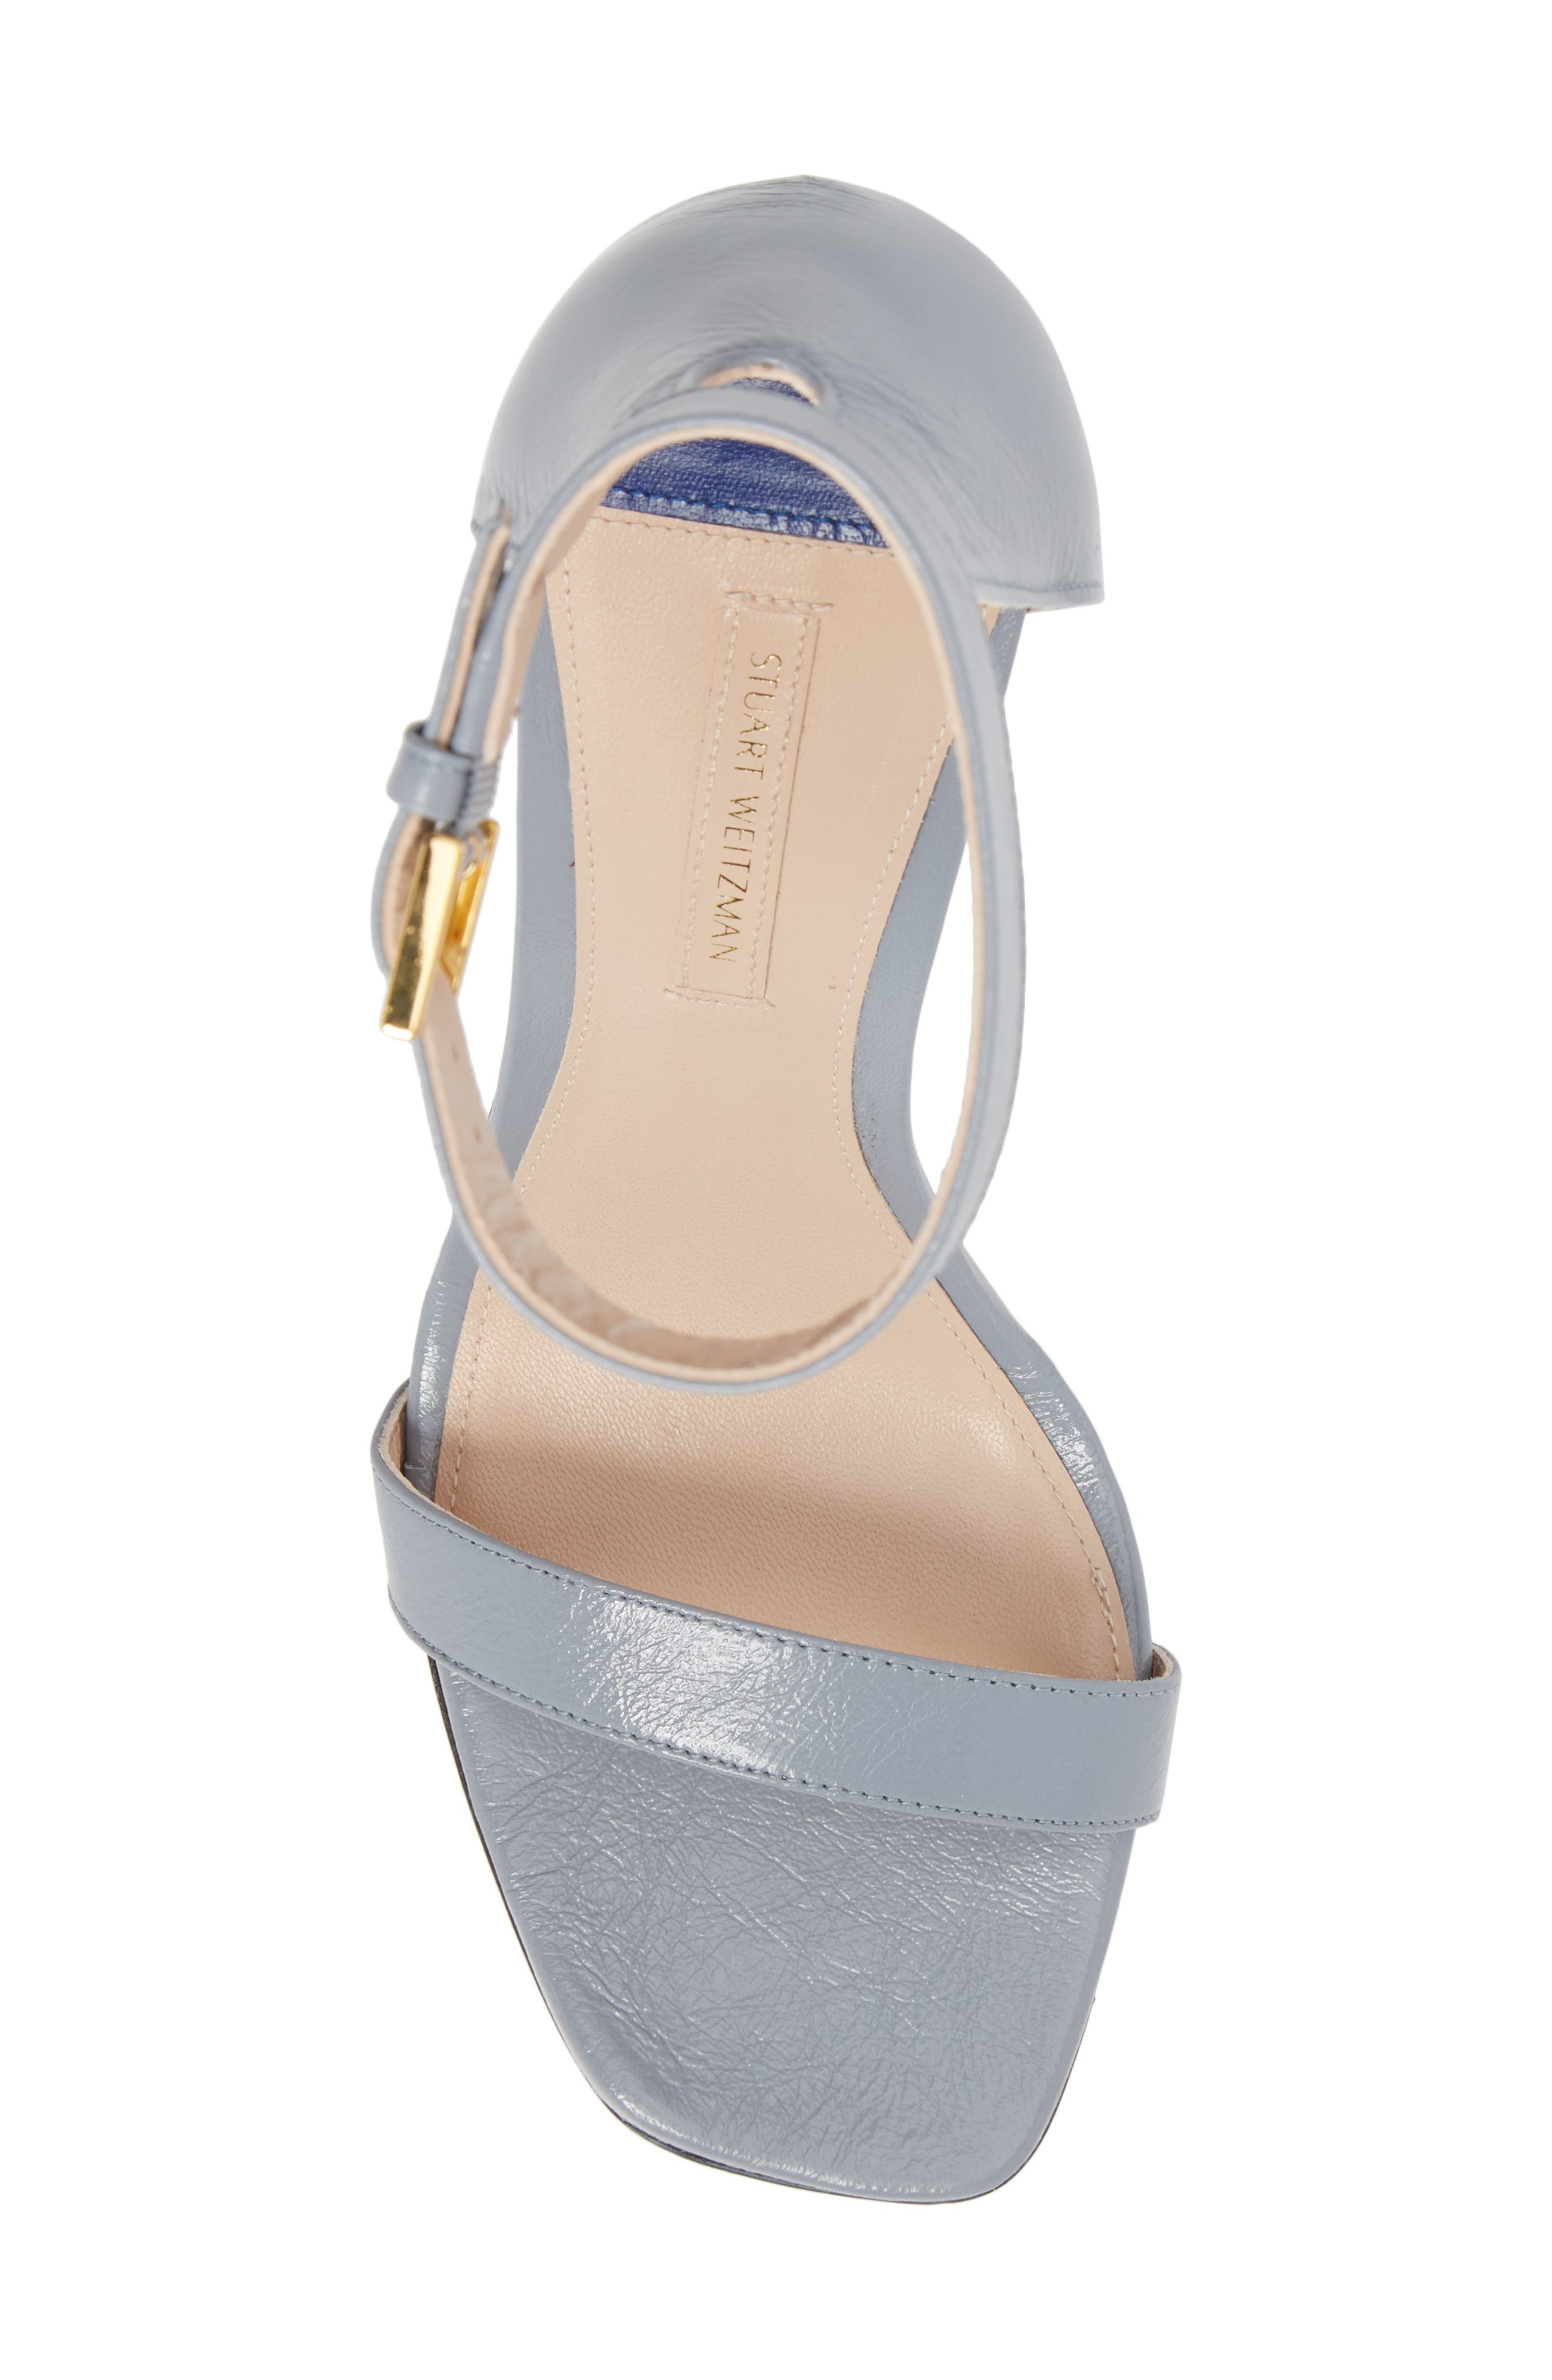 100SQUARENUDIST Sandal,                             Alternate thumbnail 5, color,                             Dovetail Gleaming Tripon